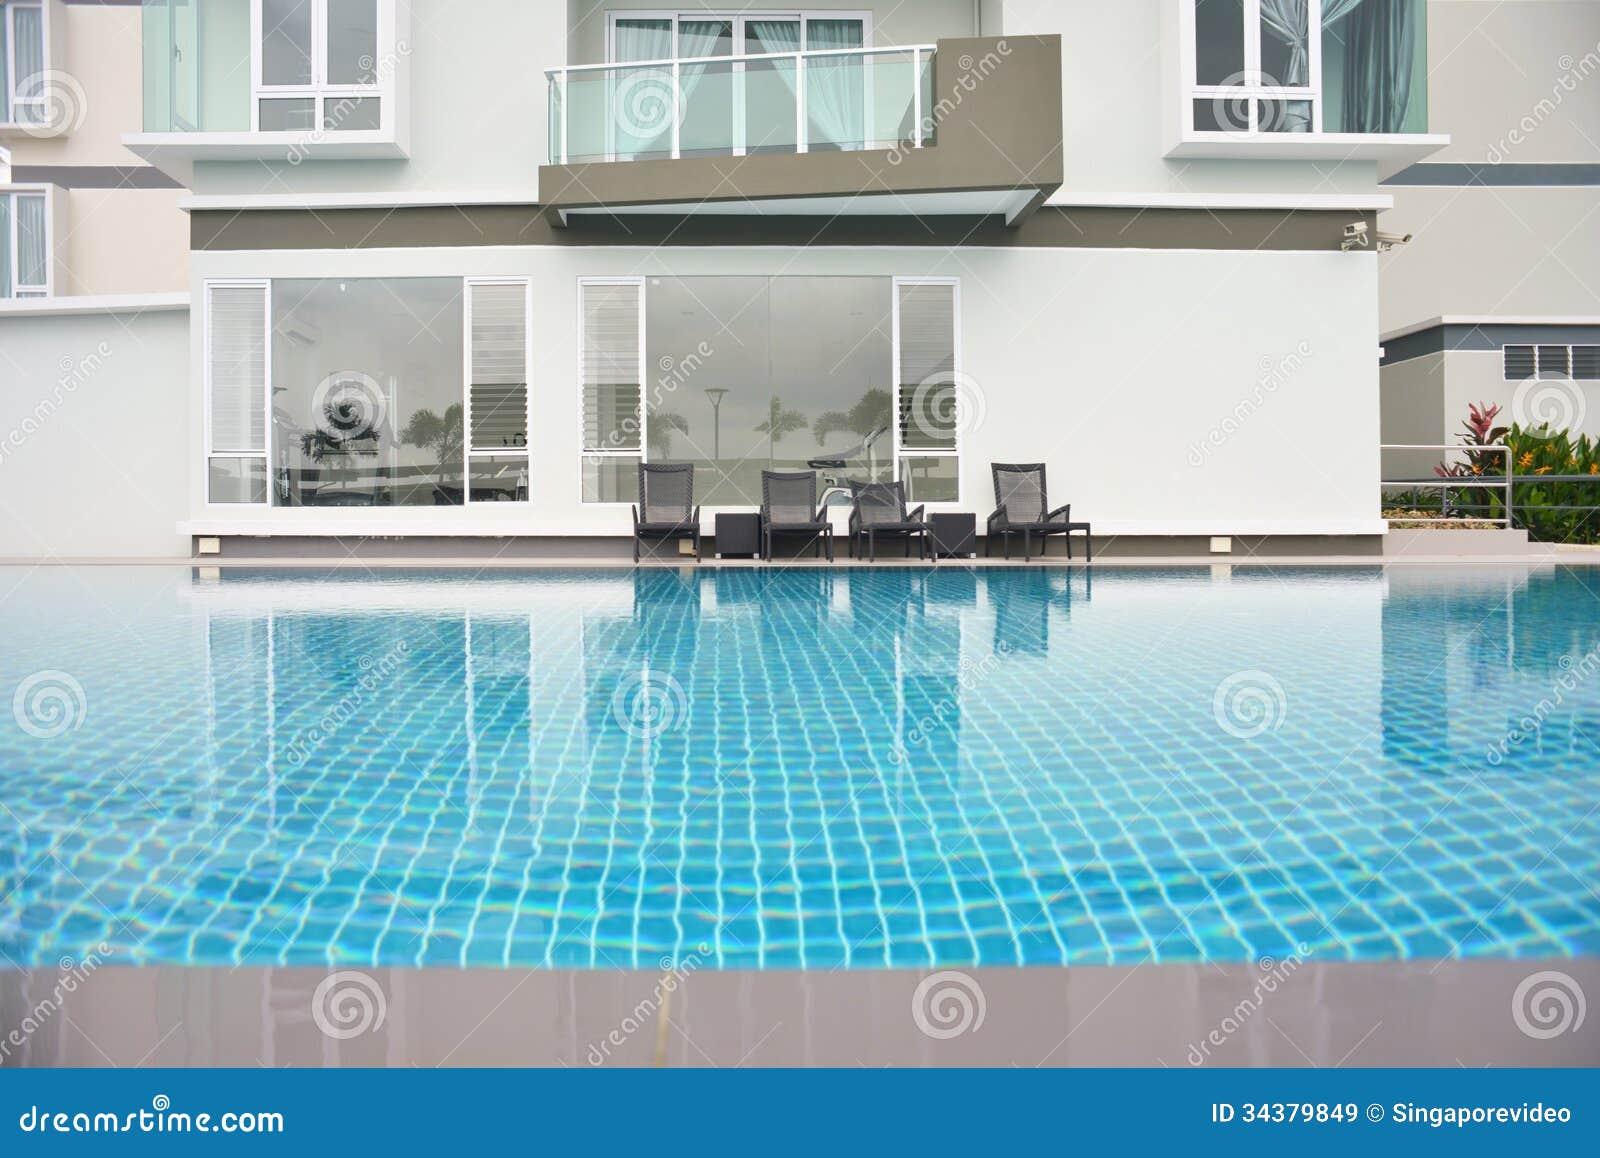 Generic Condominium Outdoor With Swimming Pool Royalty